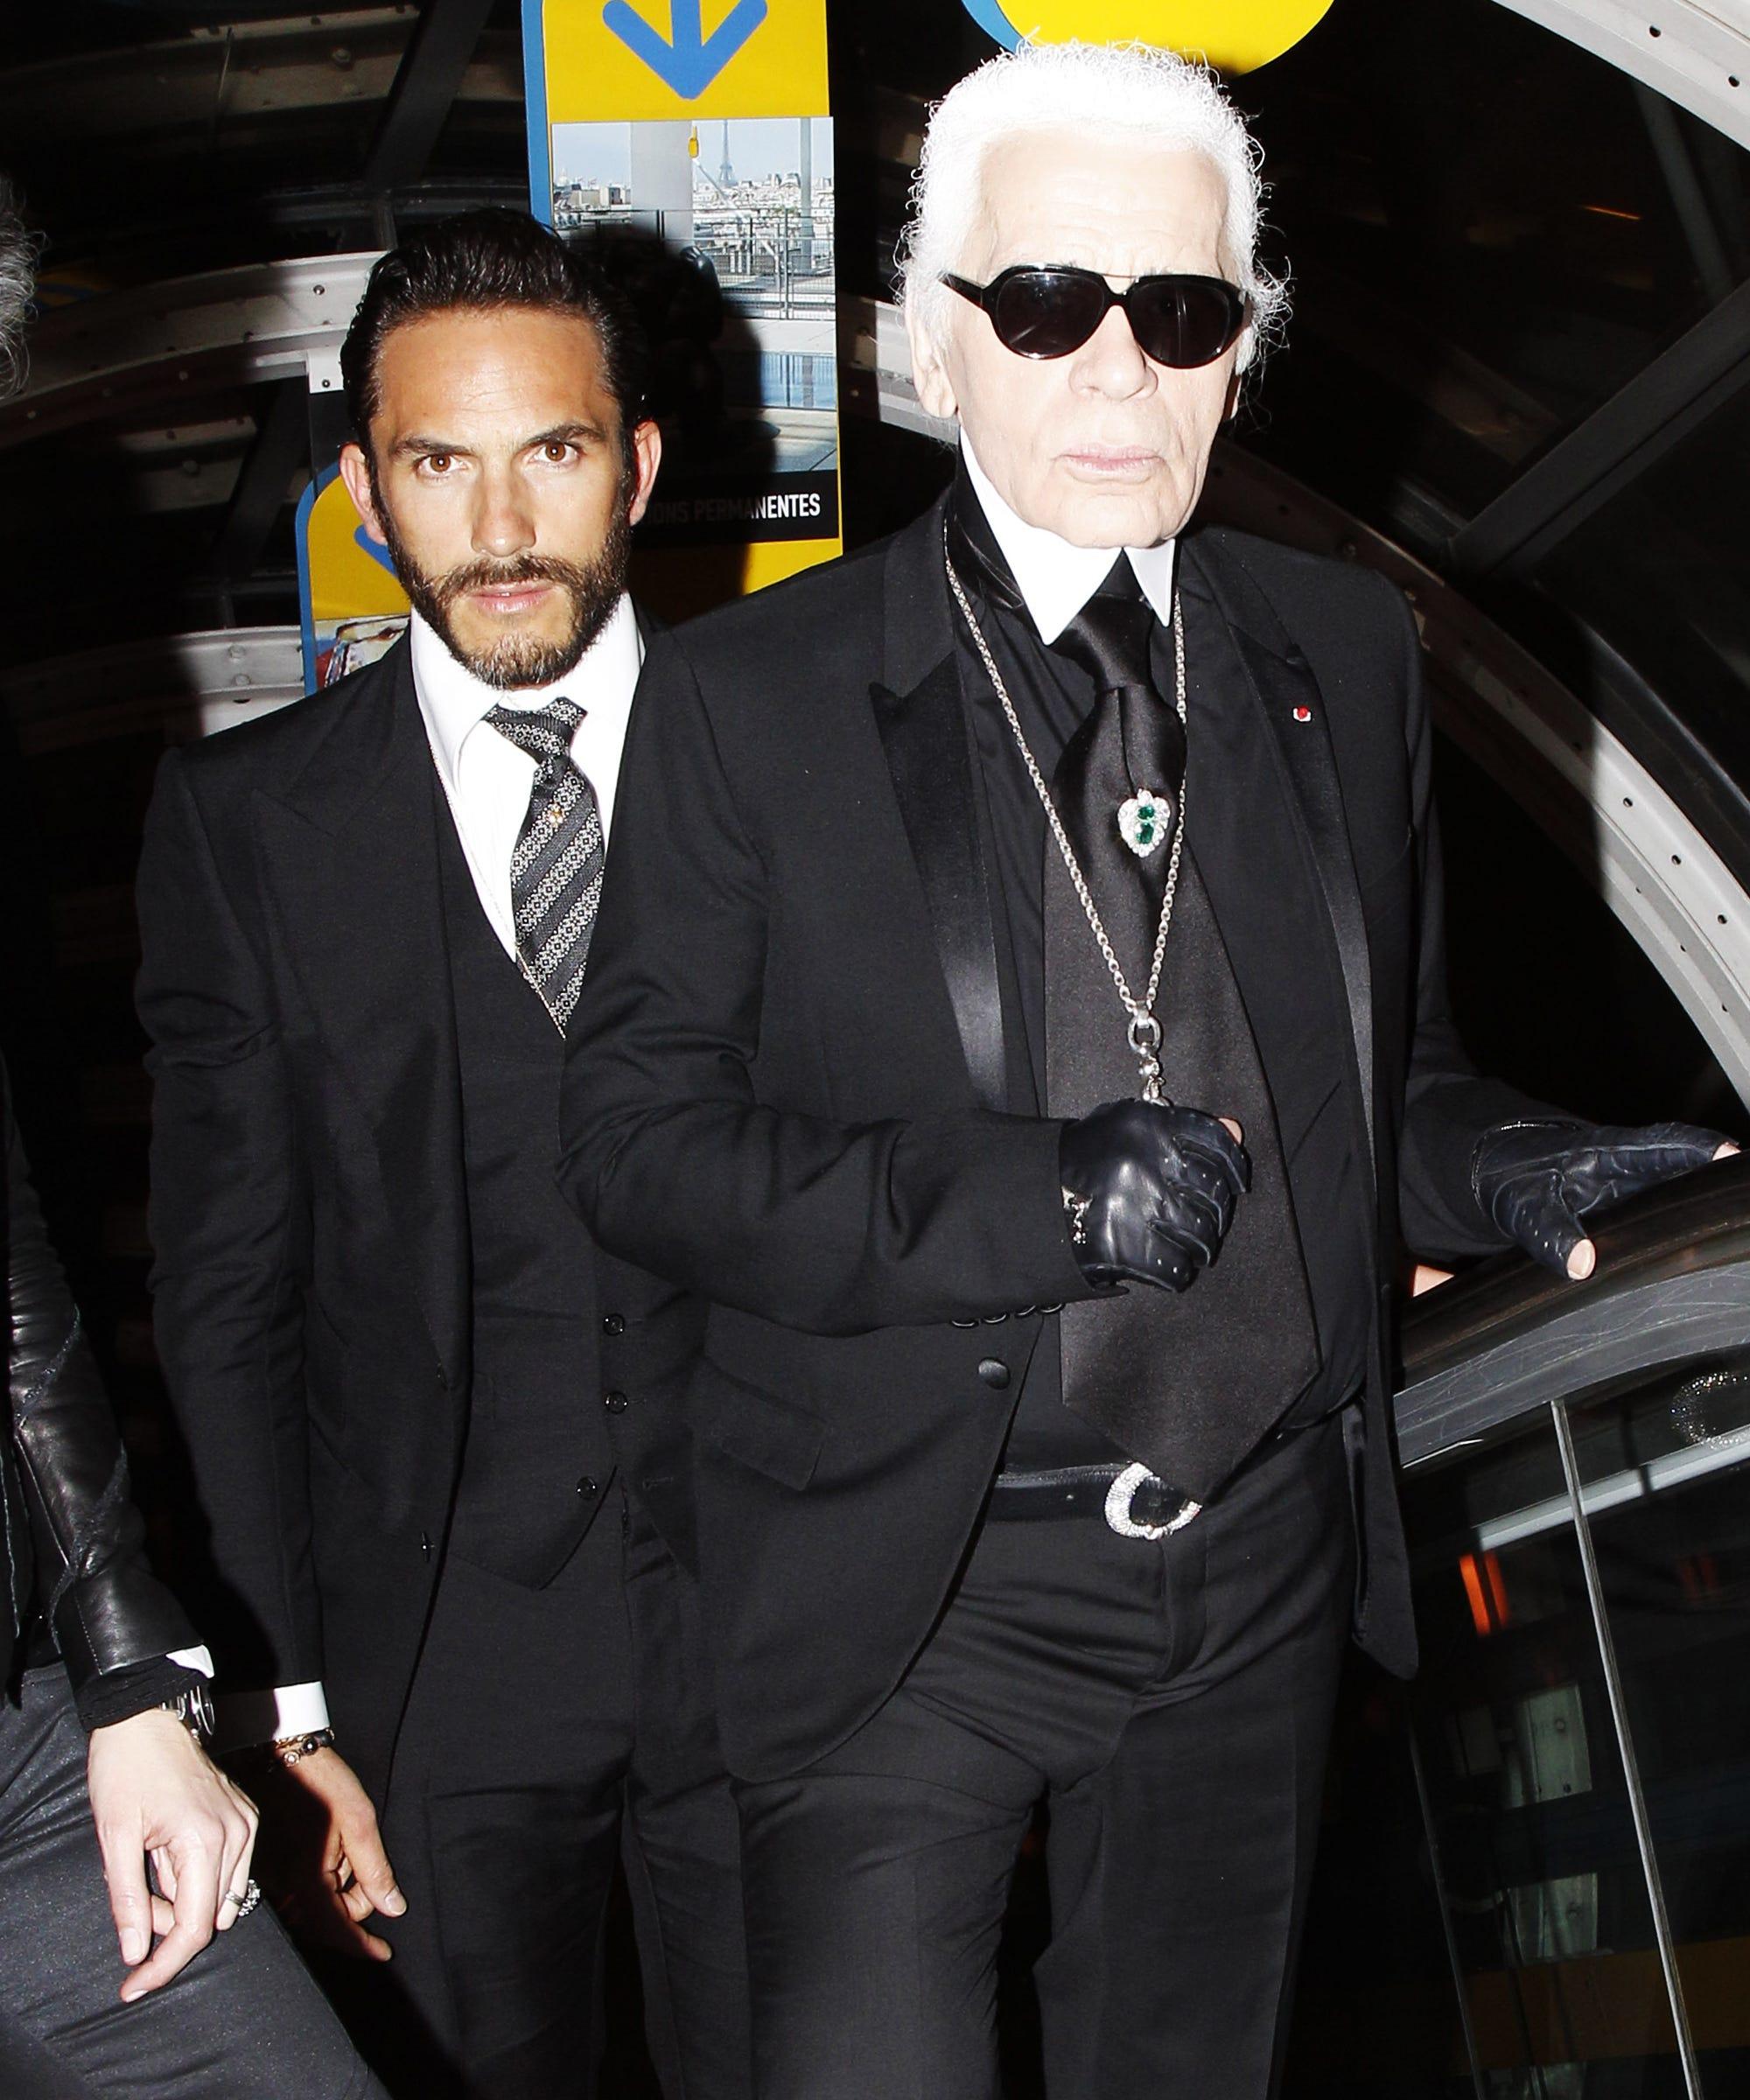 Karl Lagerfeld Hot Bodyguard Is Now A Fashion Designer